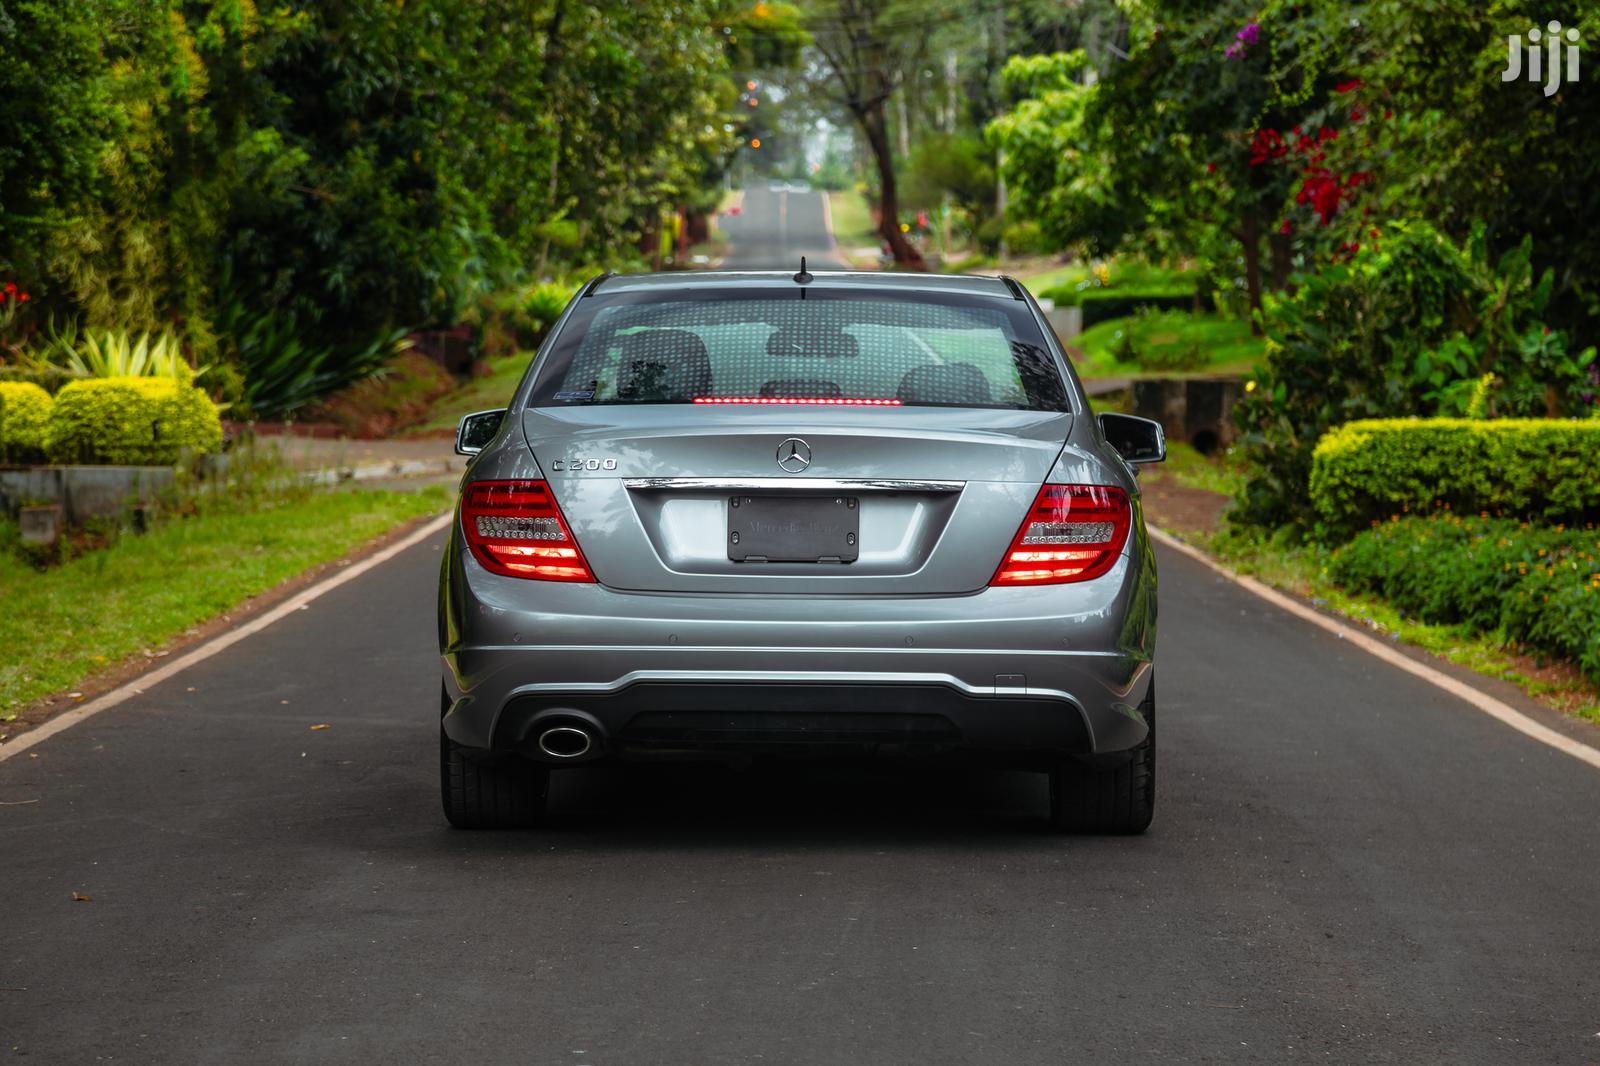 Mercedes-Benz C200 2013 Gray   Cars for sale in Kilimani, Nairobi, Kenya